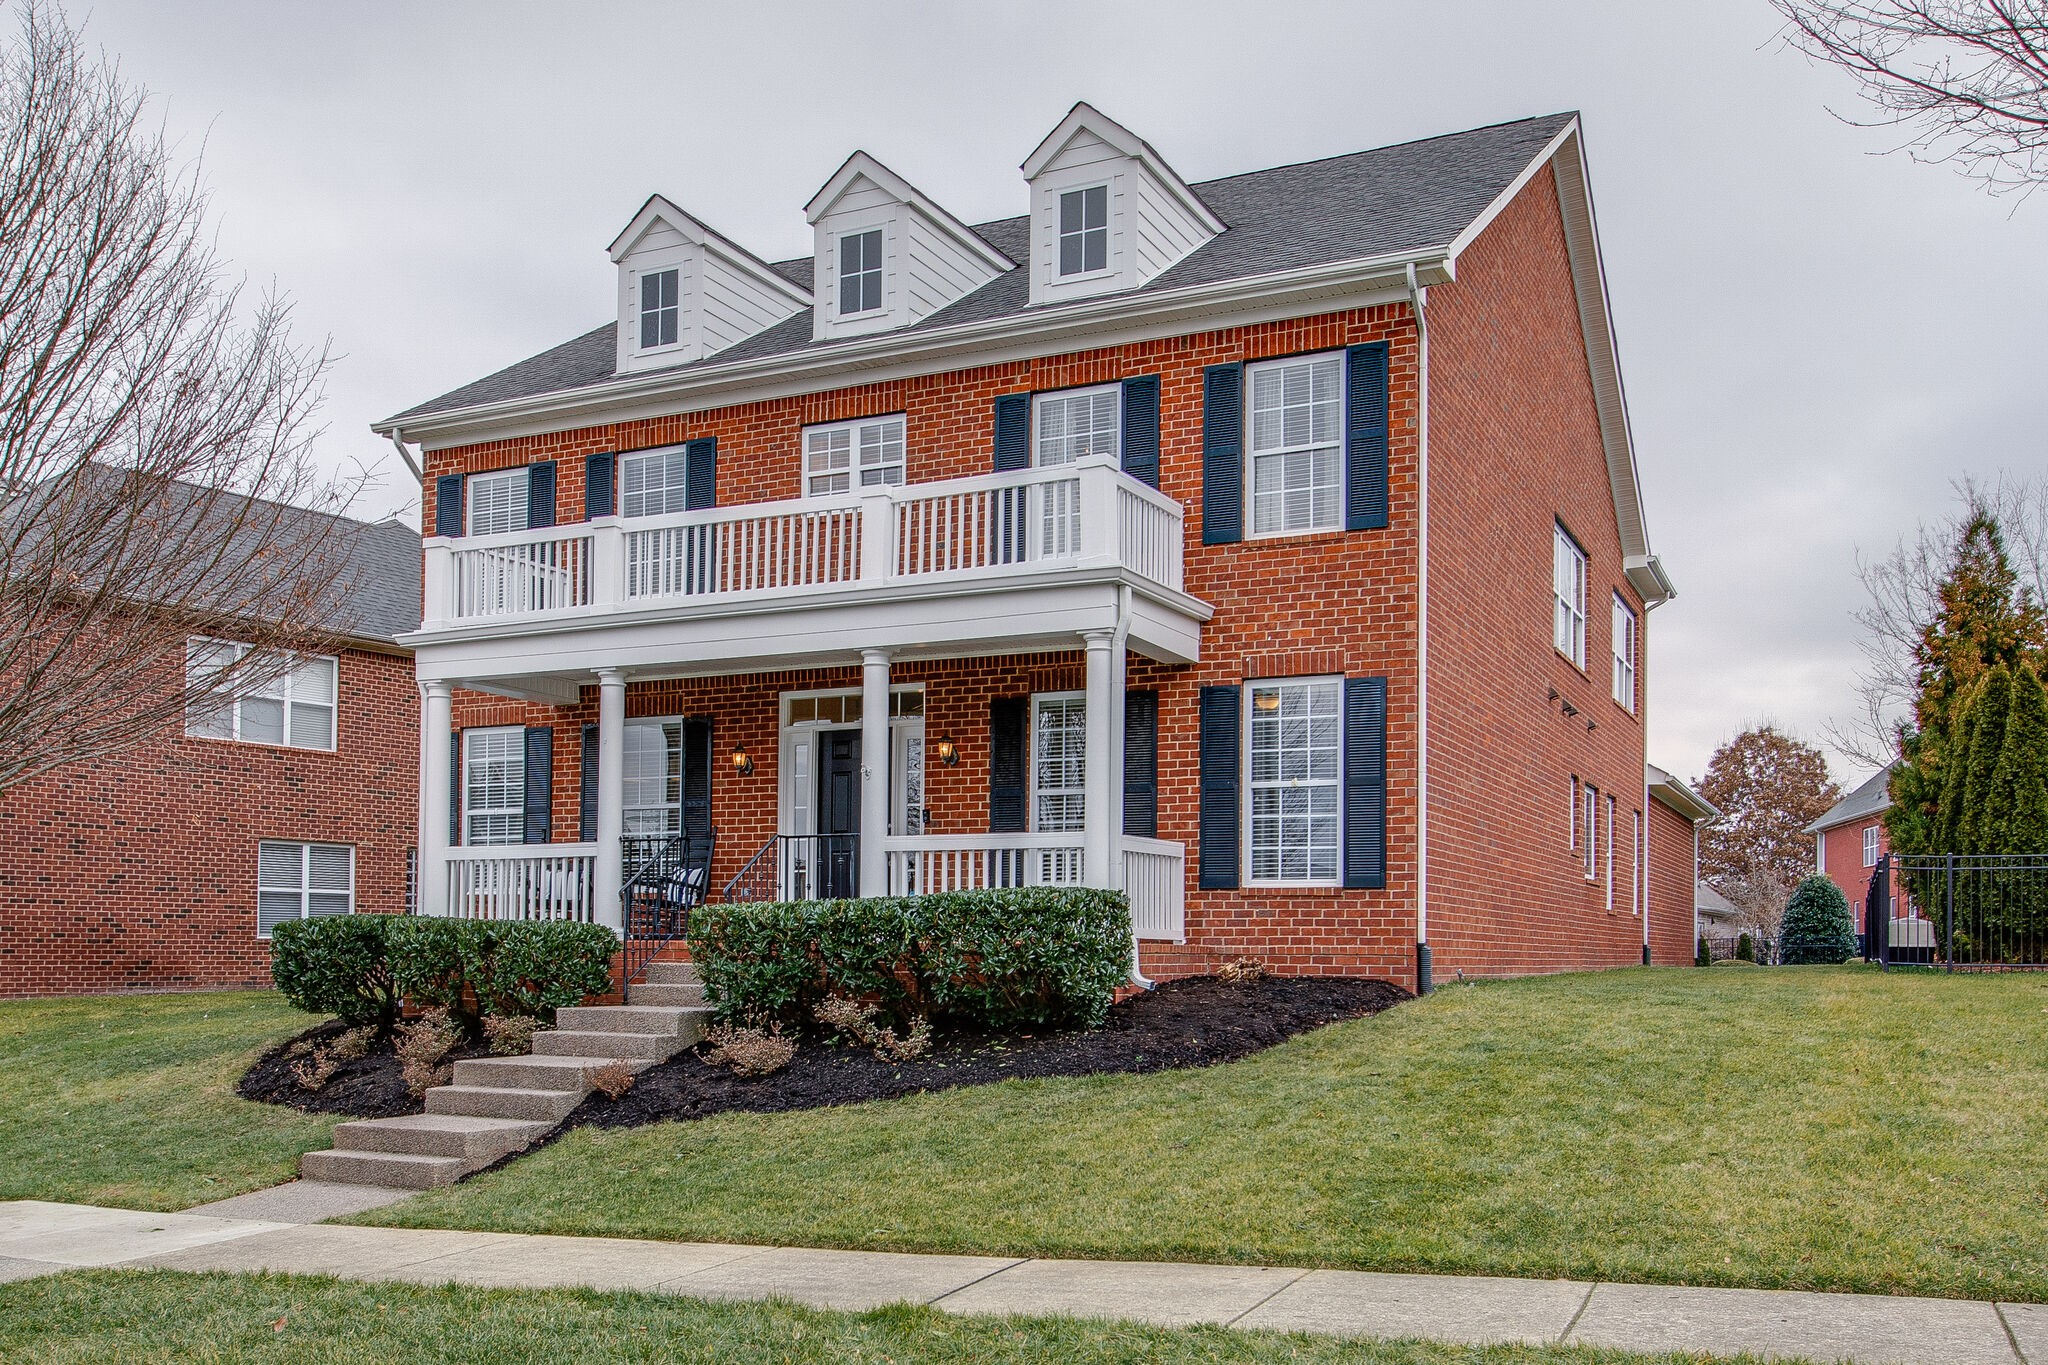 417 Wandering Trl Property Photo - Franklin, TN real estate listing